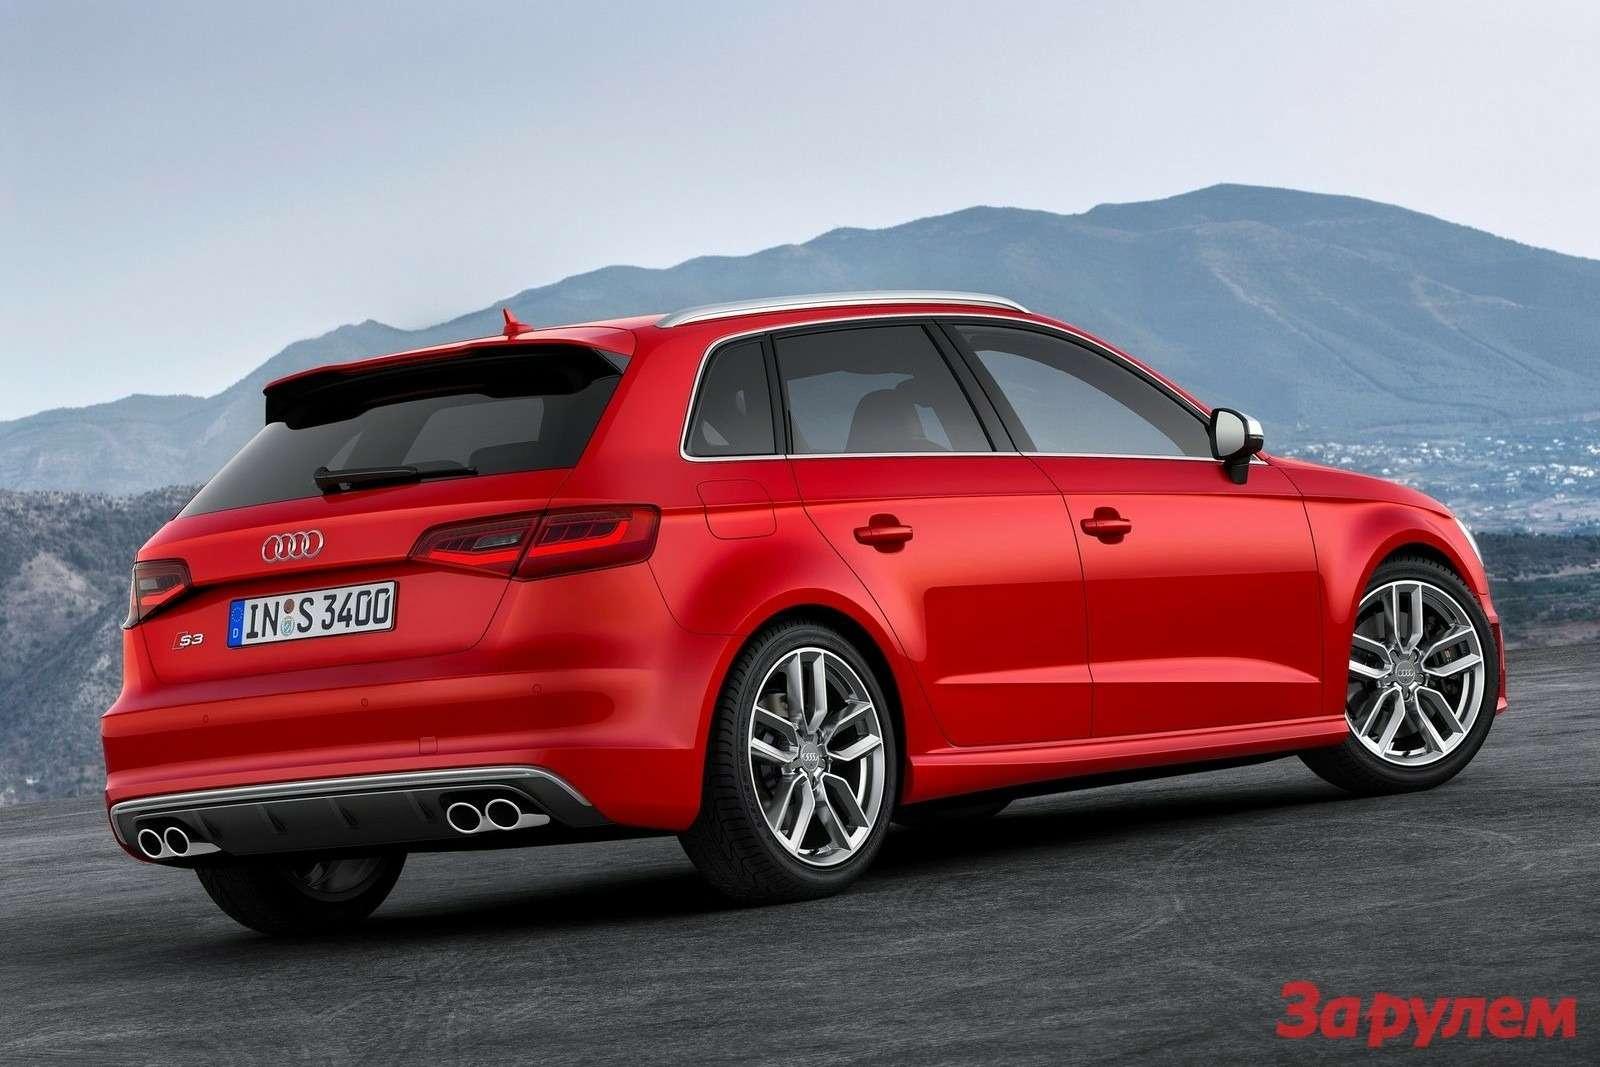 Audi-S3_Sportback_2014_1600x1200_wallpaper_04